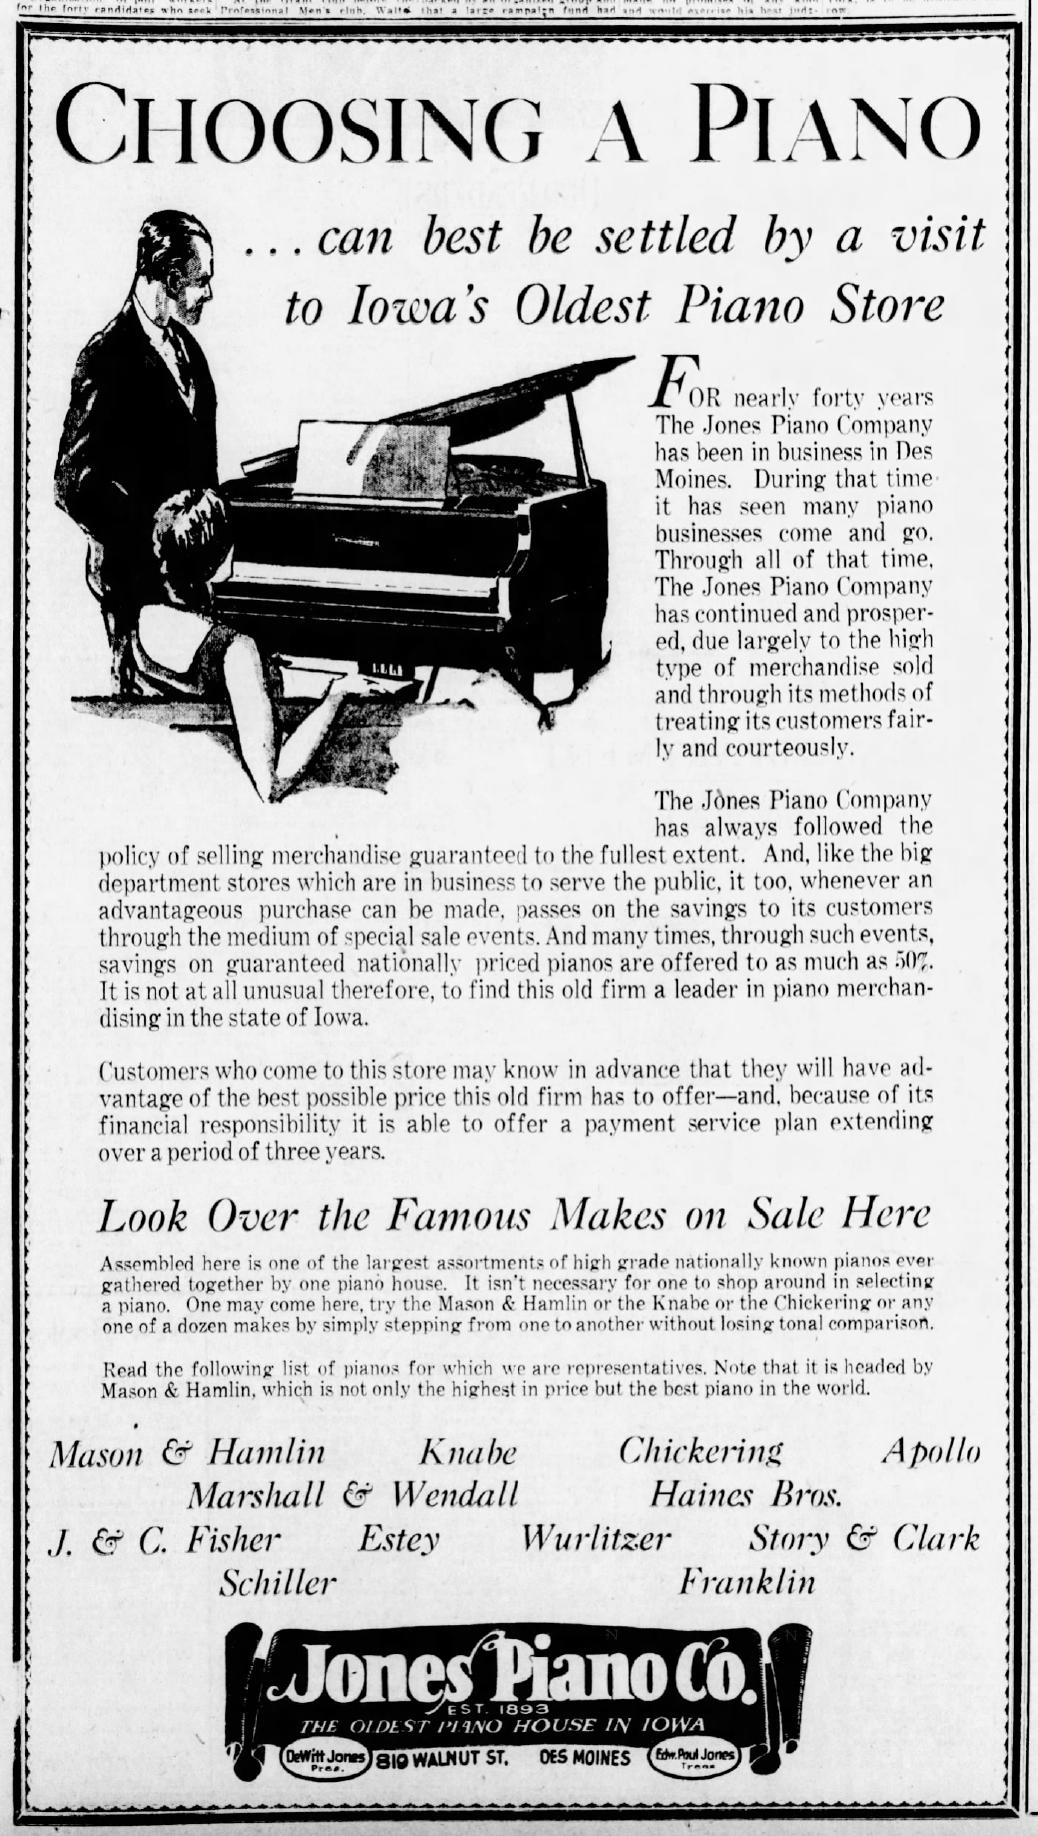 Choosing a Piano 1928.jpg